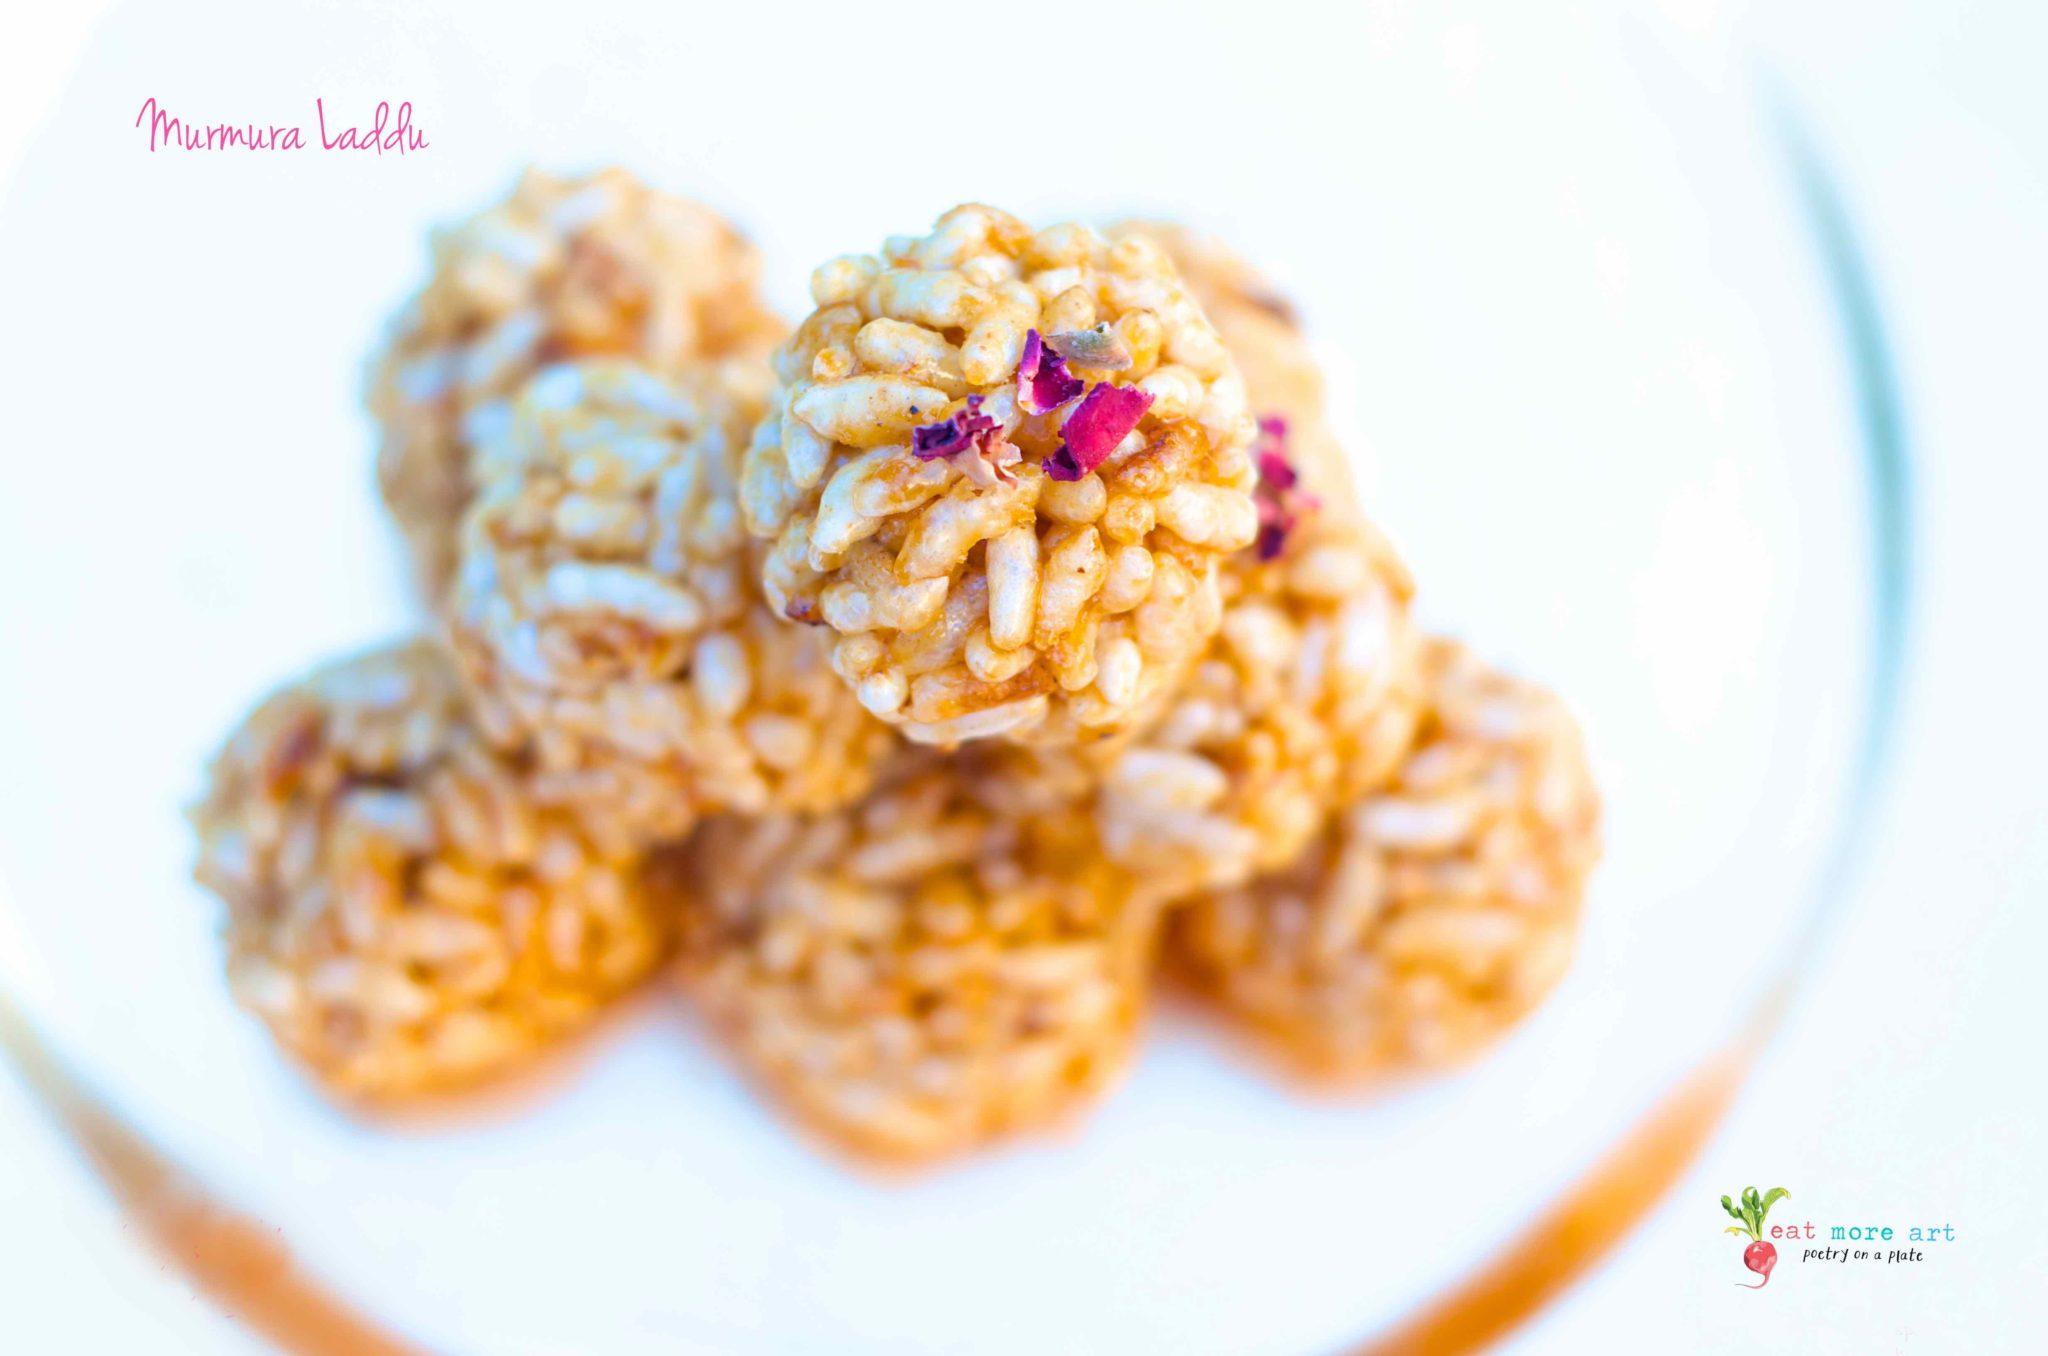 Murmura Laddu   Puffed Rice Balls   Eat More Art